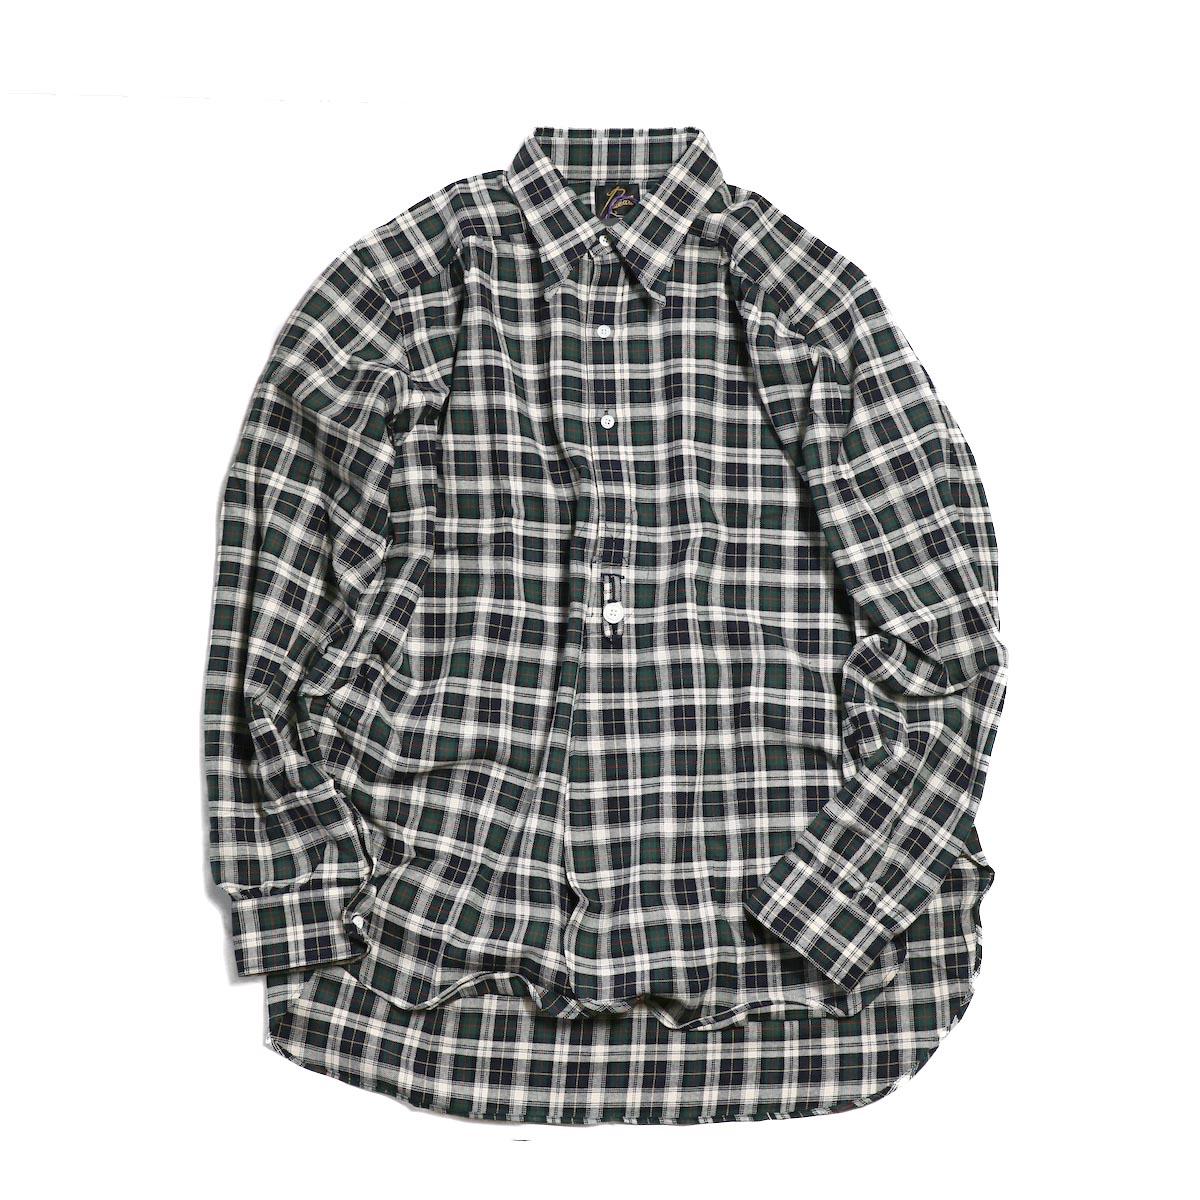 NEEDLES / Regular Collar Edw Gather Shirt Cotton Twill -DK.GORDON